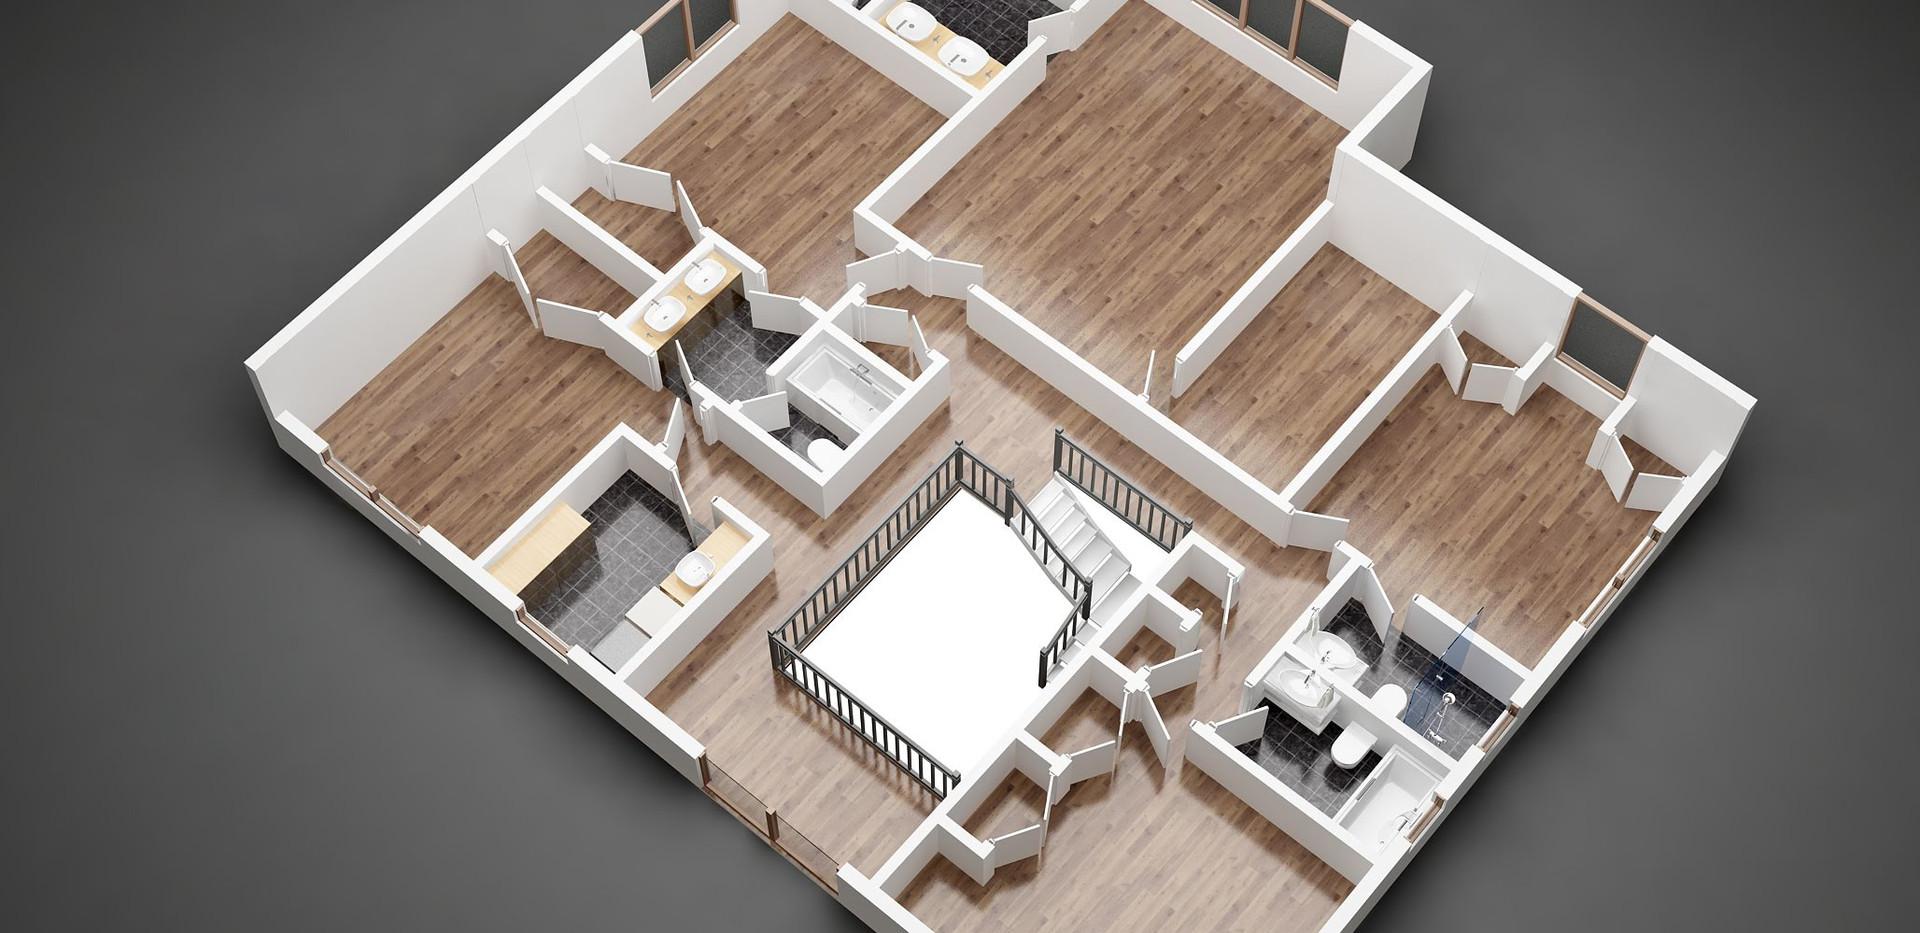 samdru_second floor_unfurniture_3D.jpg